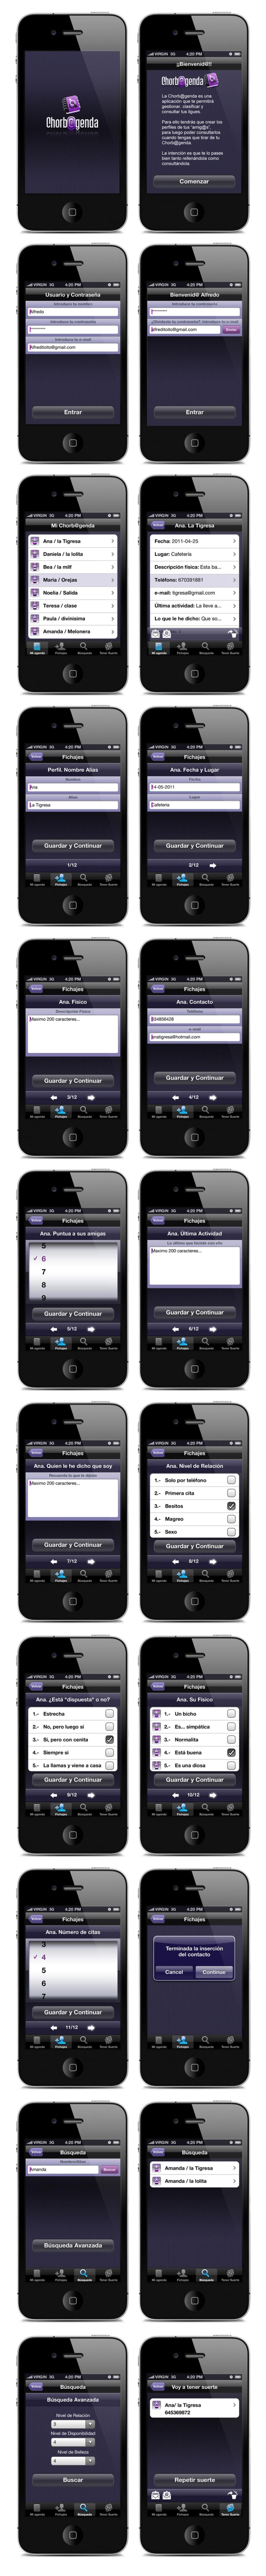 APP Chorb@genda. Proyecto para Genexies Mobile 6